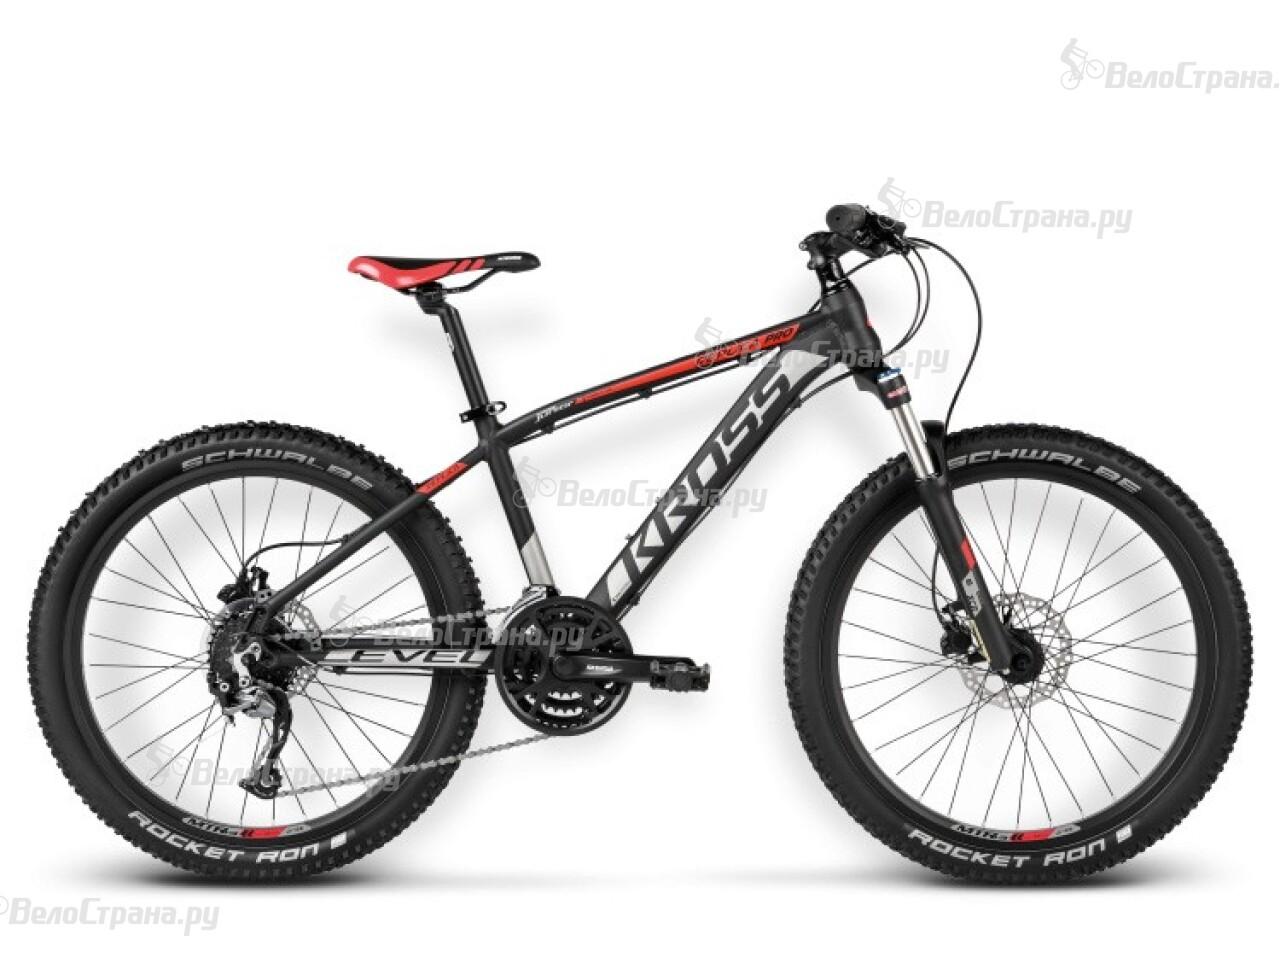 Велосипед Kross Level Replica Pro (2016) литой диск replica fr lx 98 8 5x20 5x150 d110 2 et54 gmf